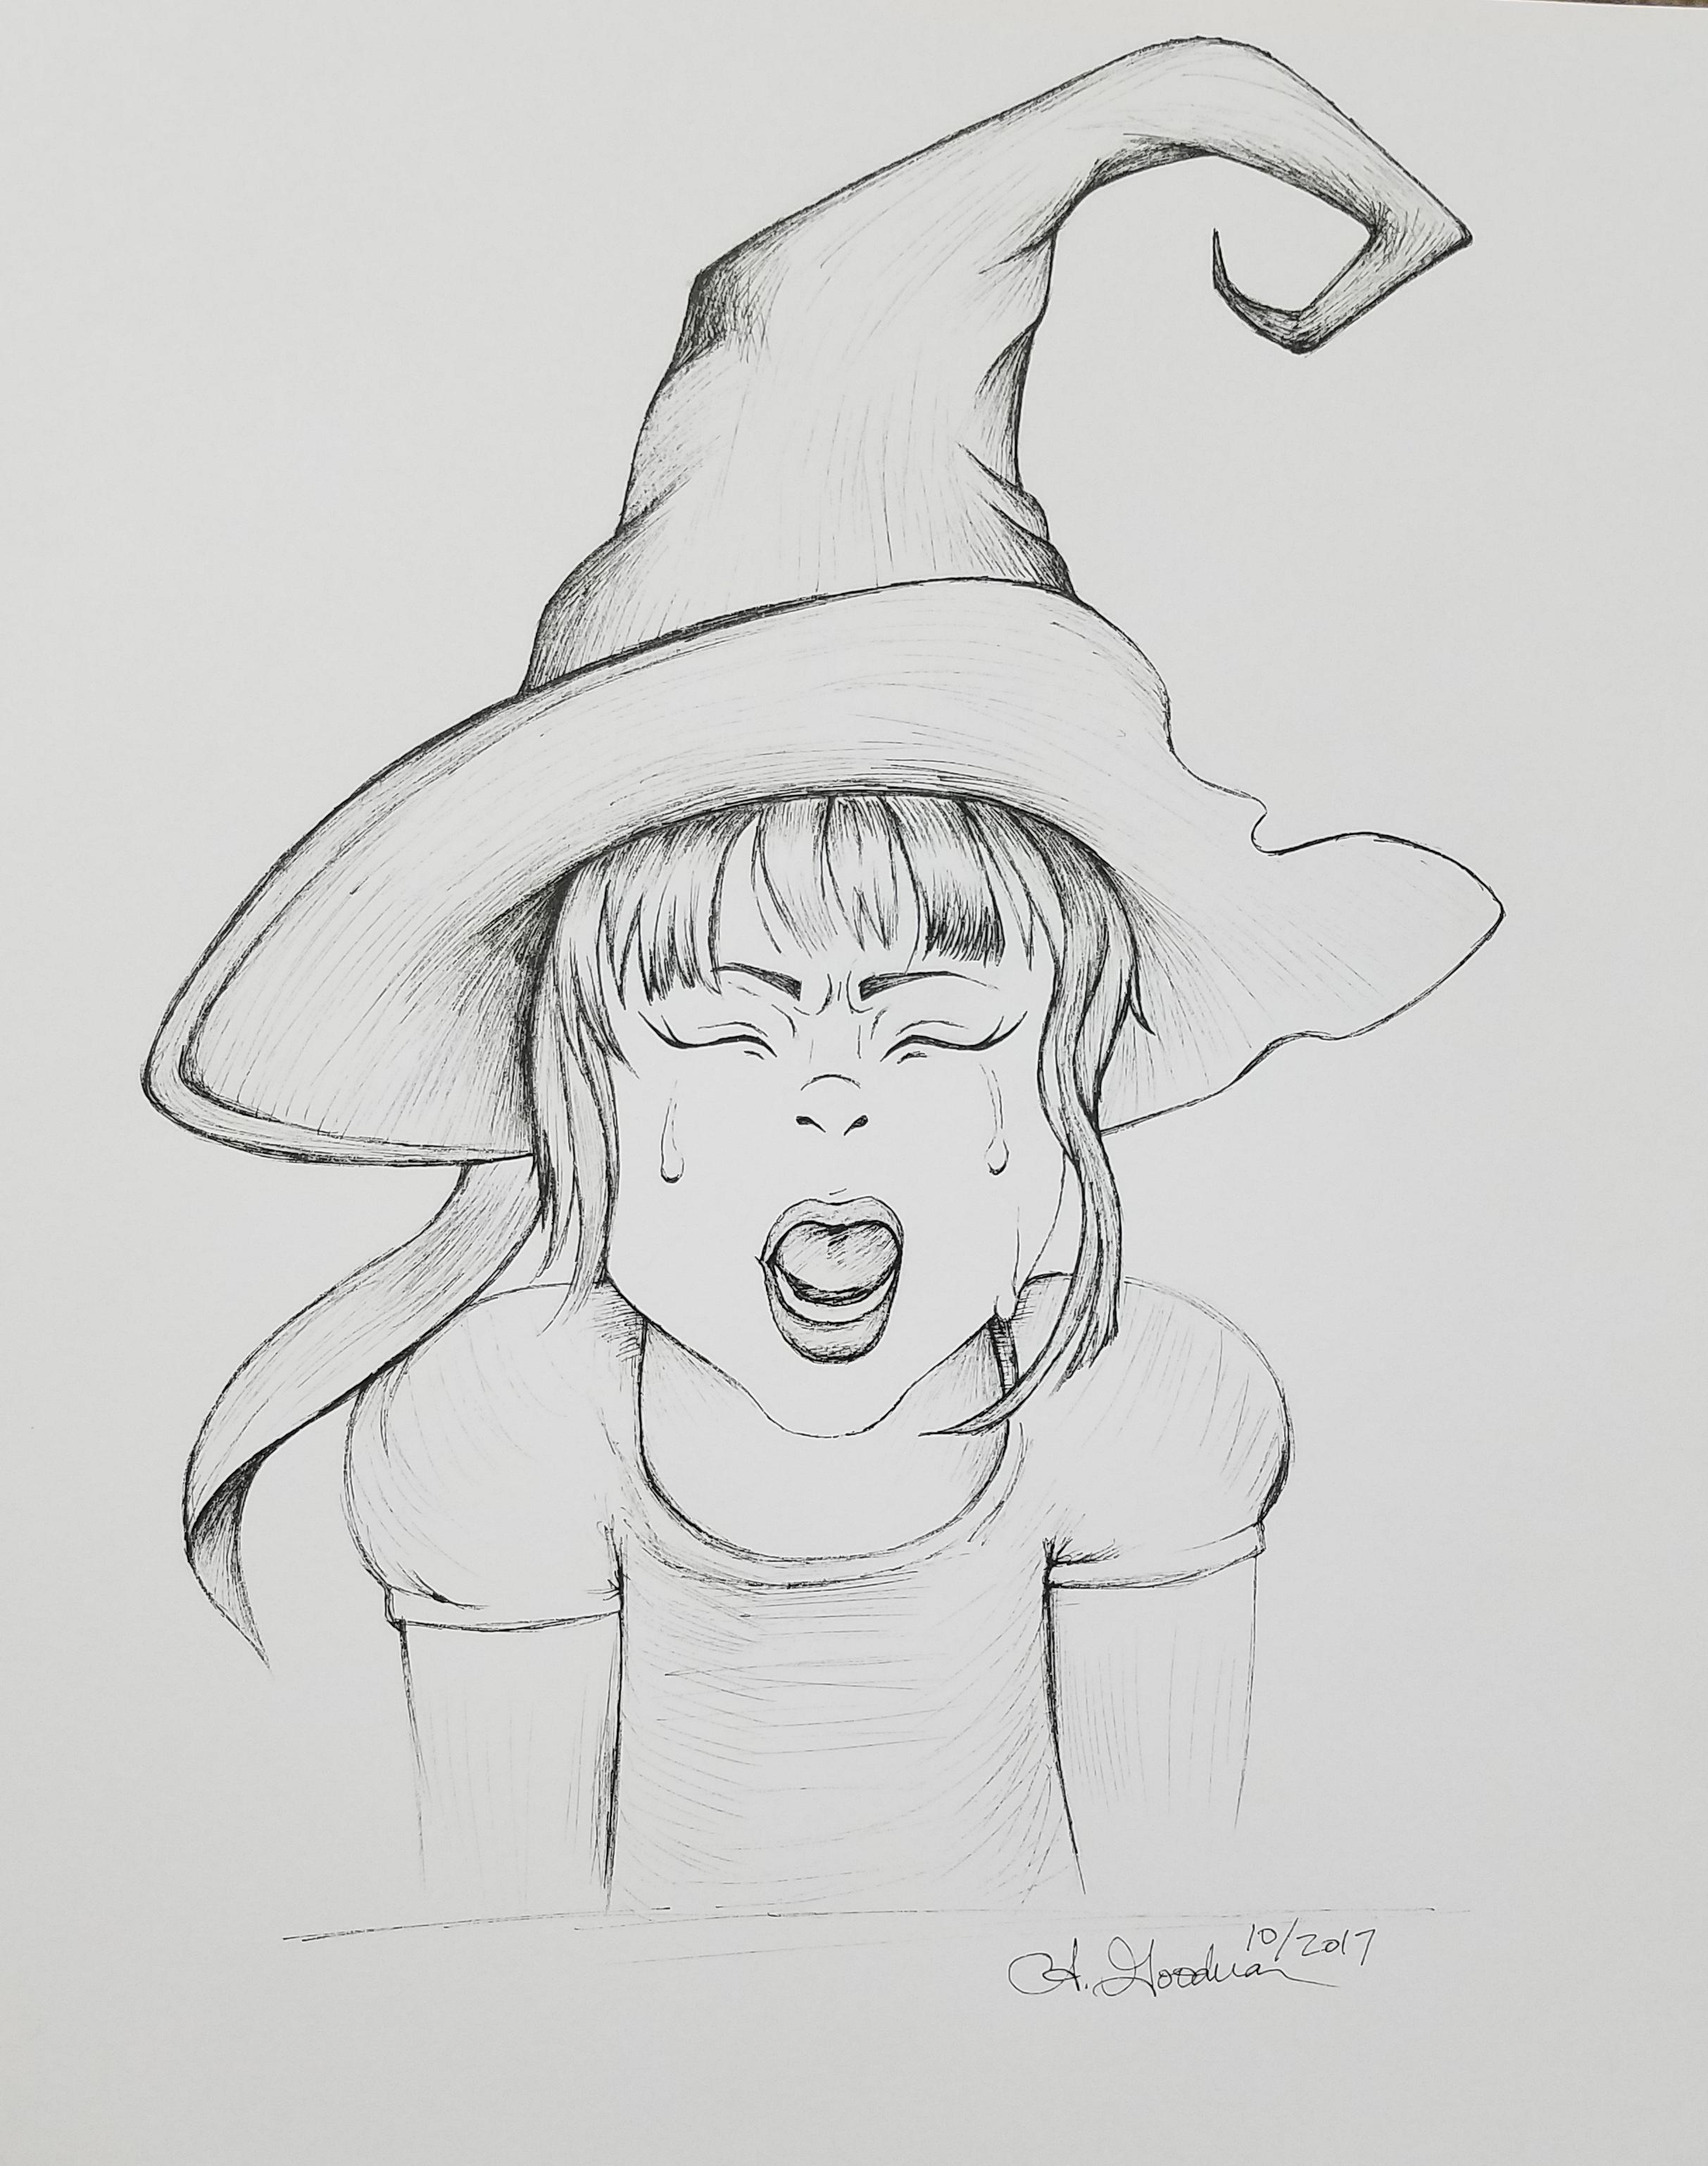 Inktober Day 21 Furious ink drawing 2017 alecia goodman